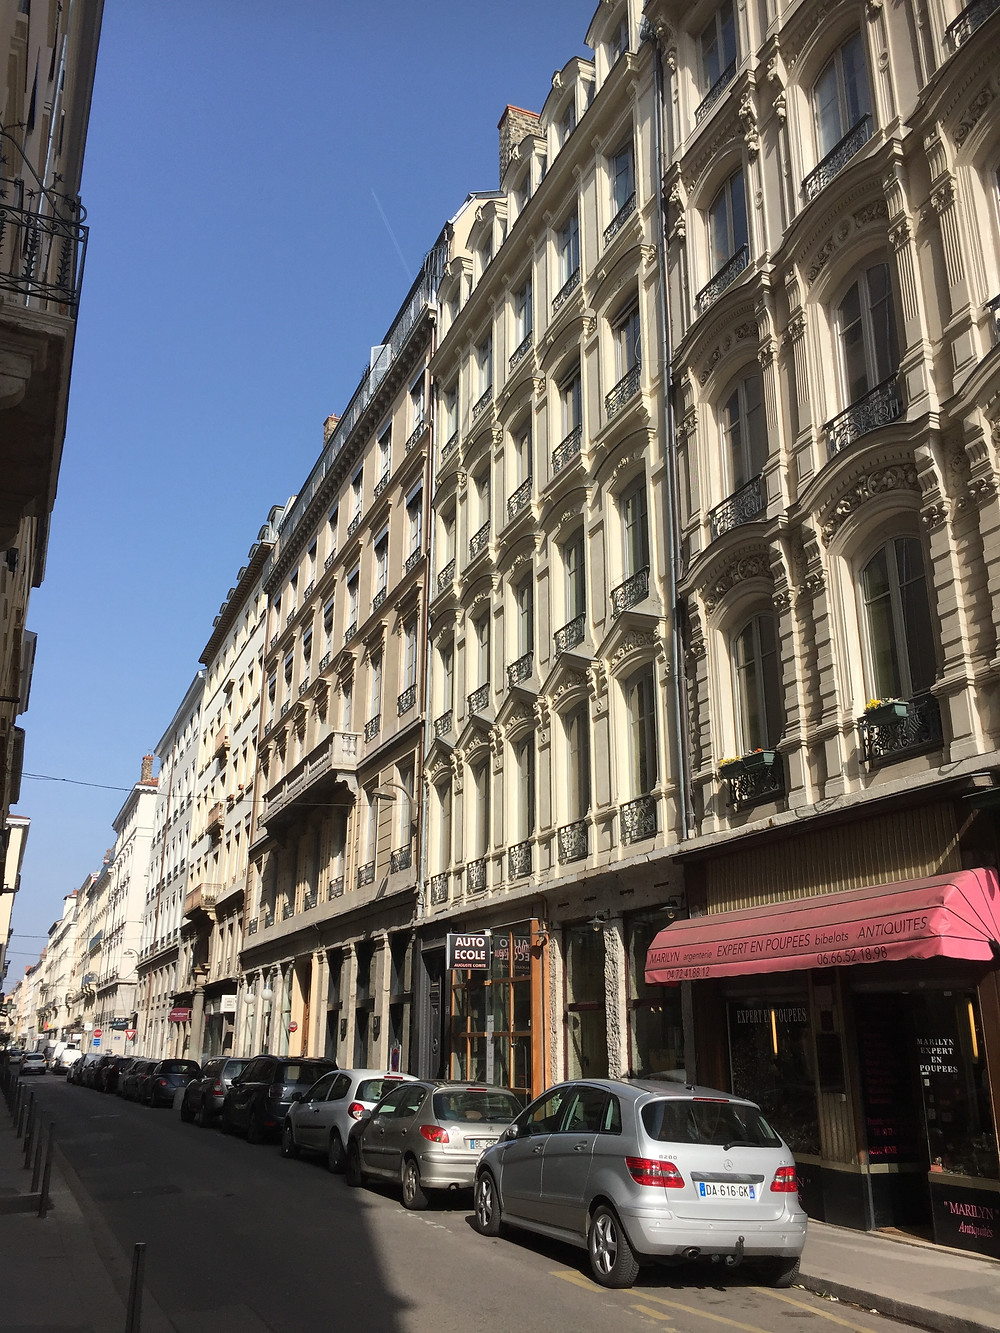 Smart Home Immobilier Conseil, T3 rue Auguste Comte Lyon 2, quartier Ainay